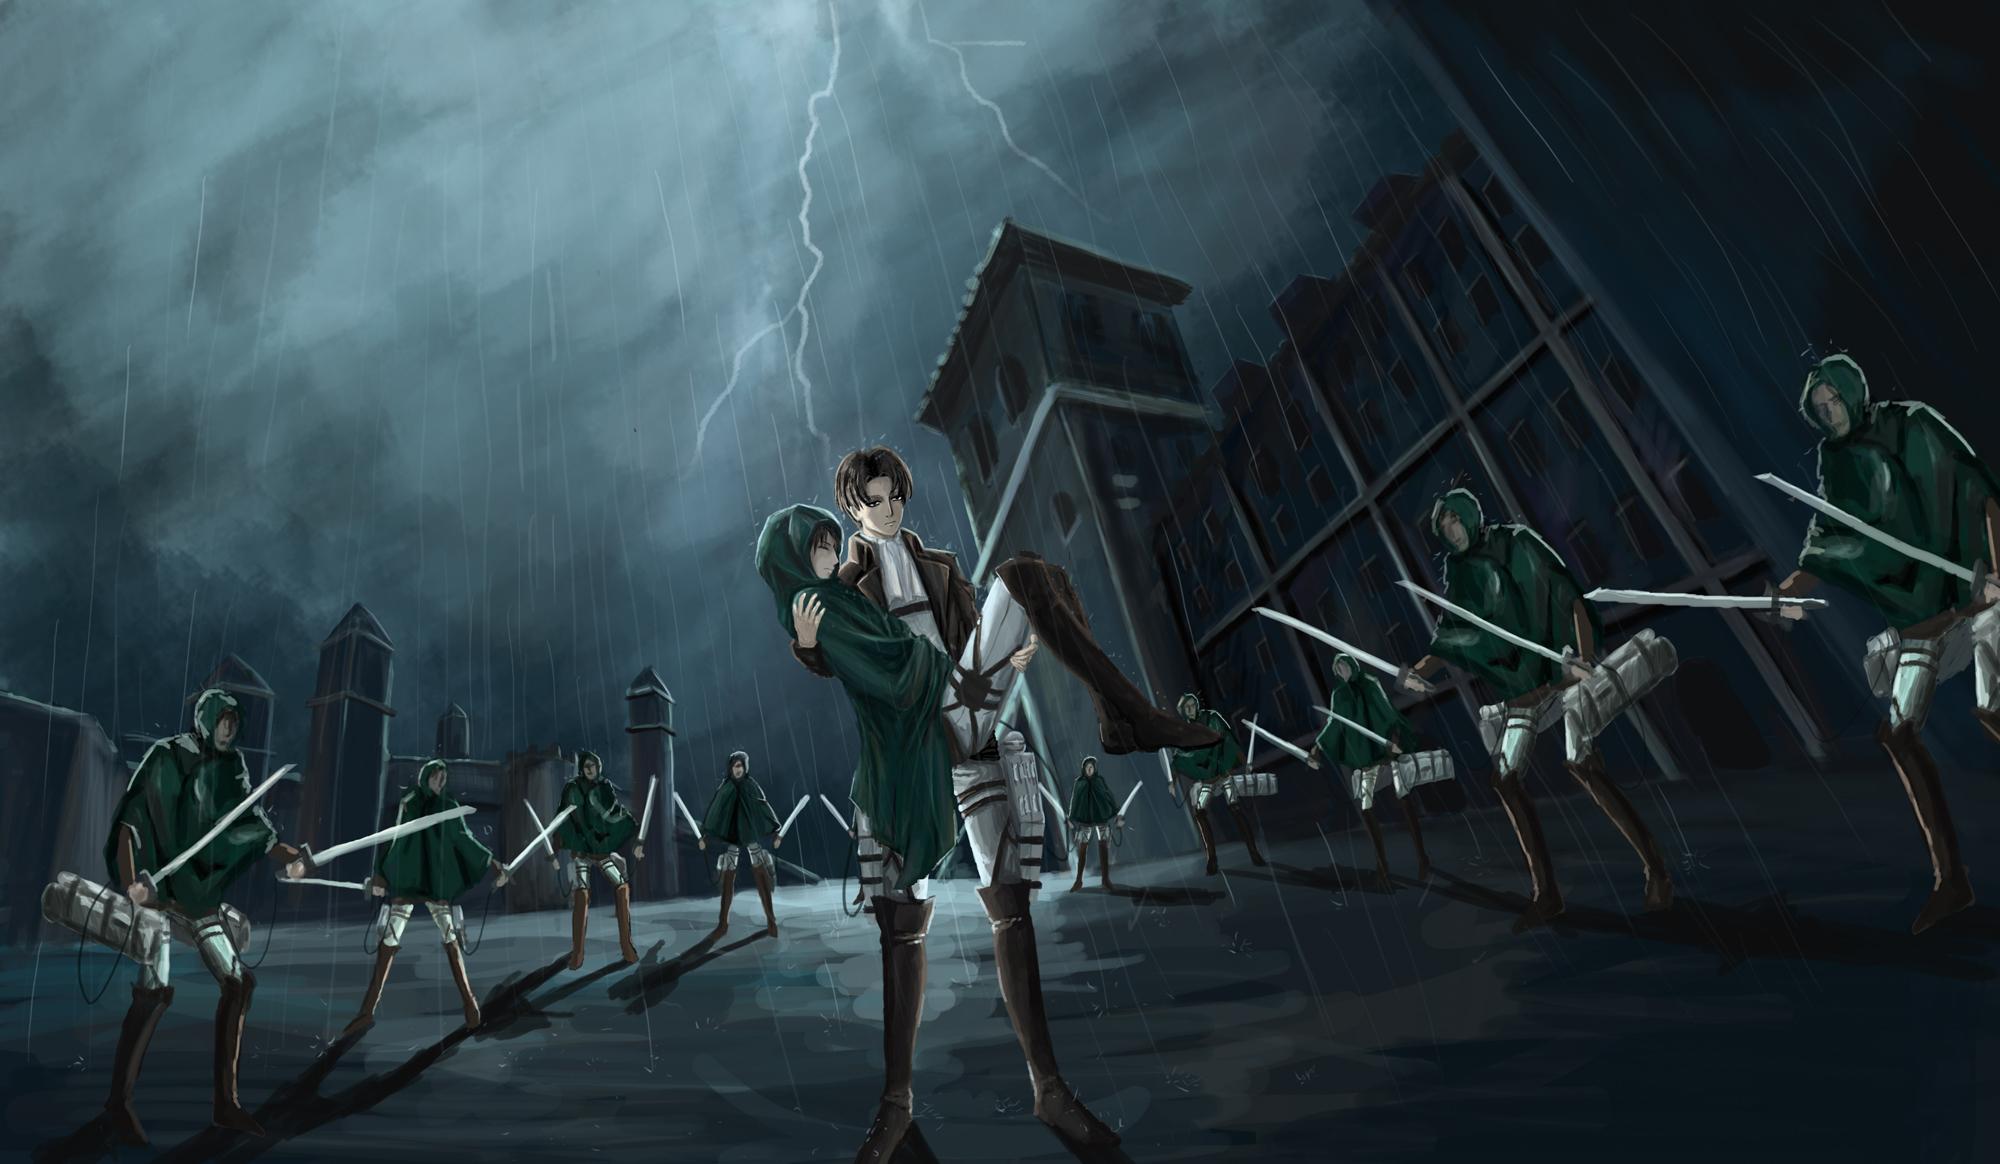 Attack On Titan Wallpaper Zerochan Anime Image Board